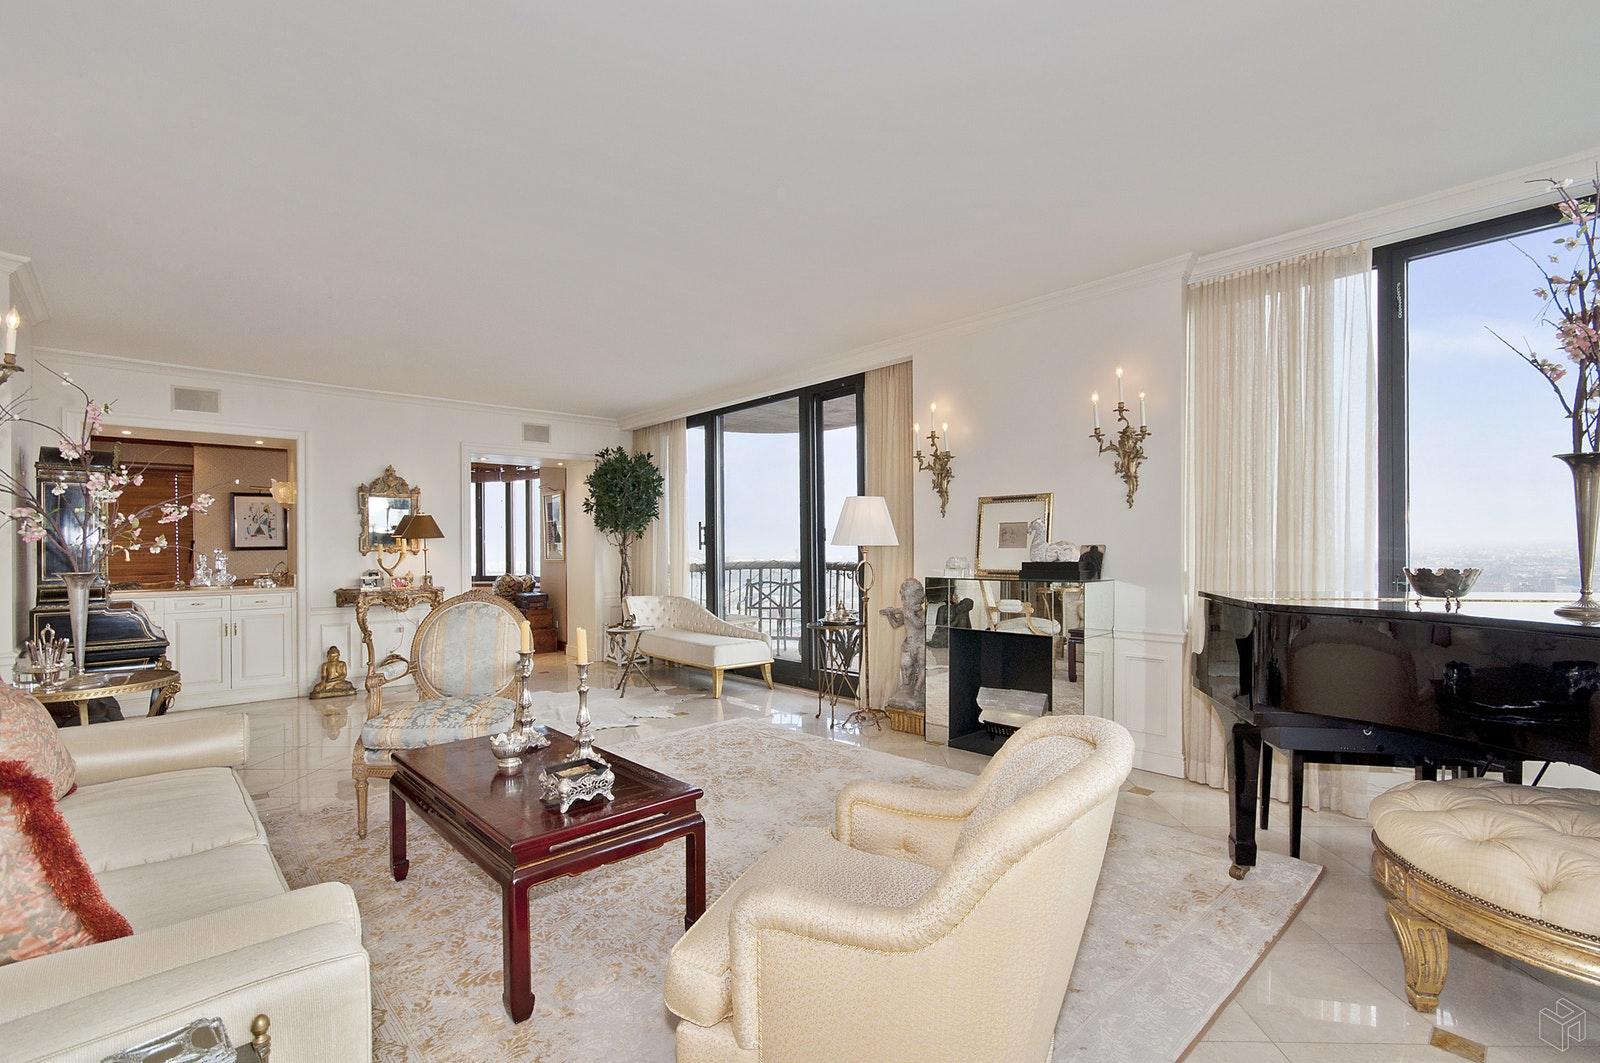 UPPER EAST SIDE, Upper East Side, $5,200,000, Web #: 19385380